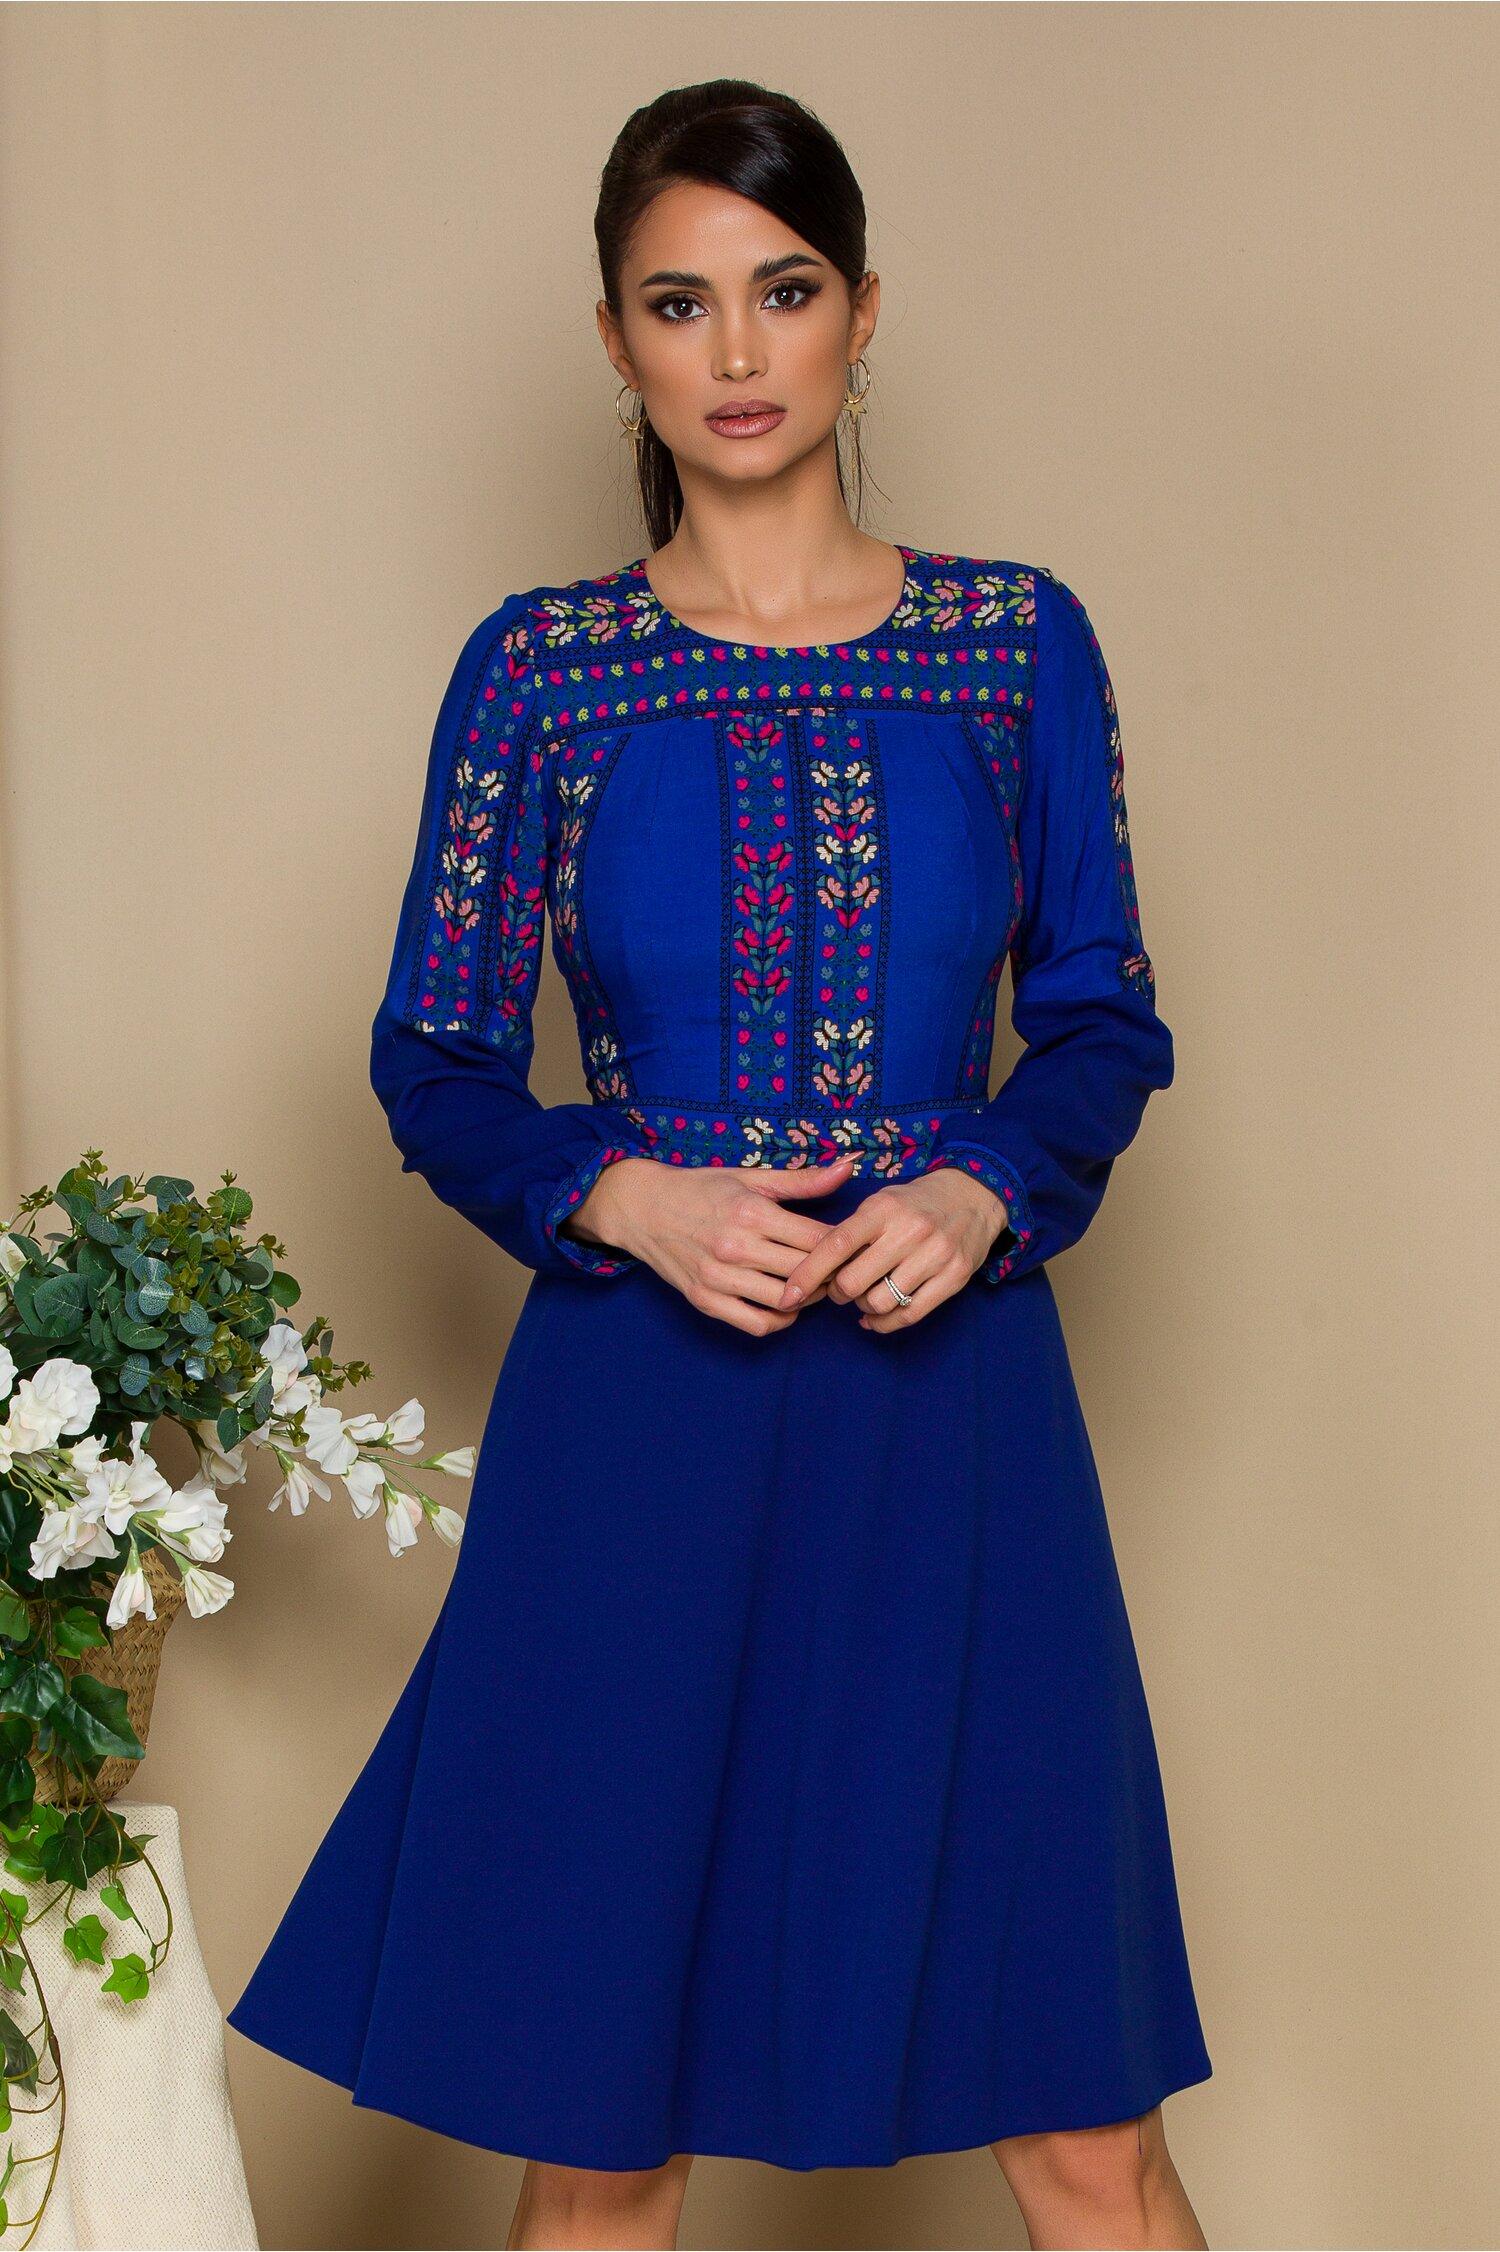 Rochie Moze albastra cu imprimeuri florale multicolore la bust si maneci